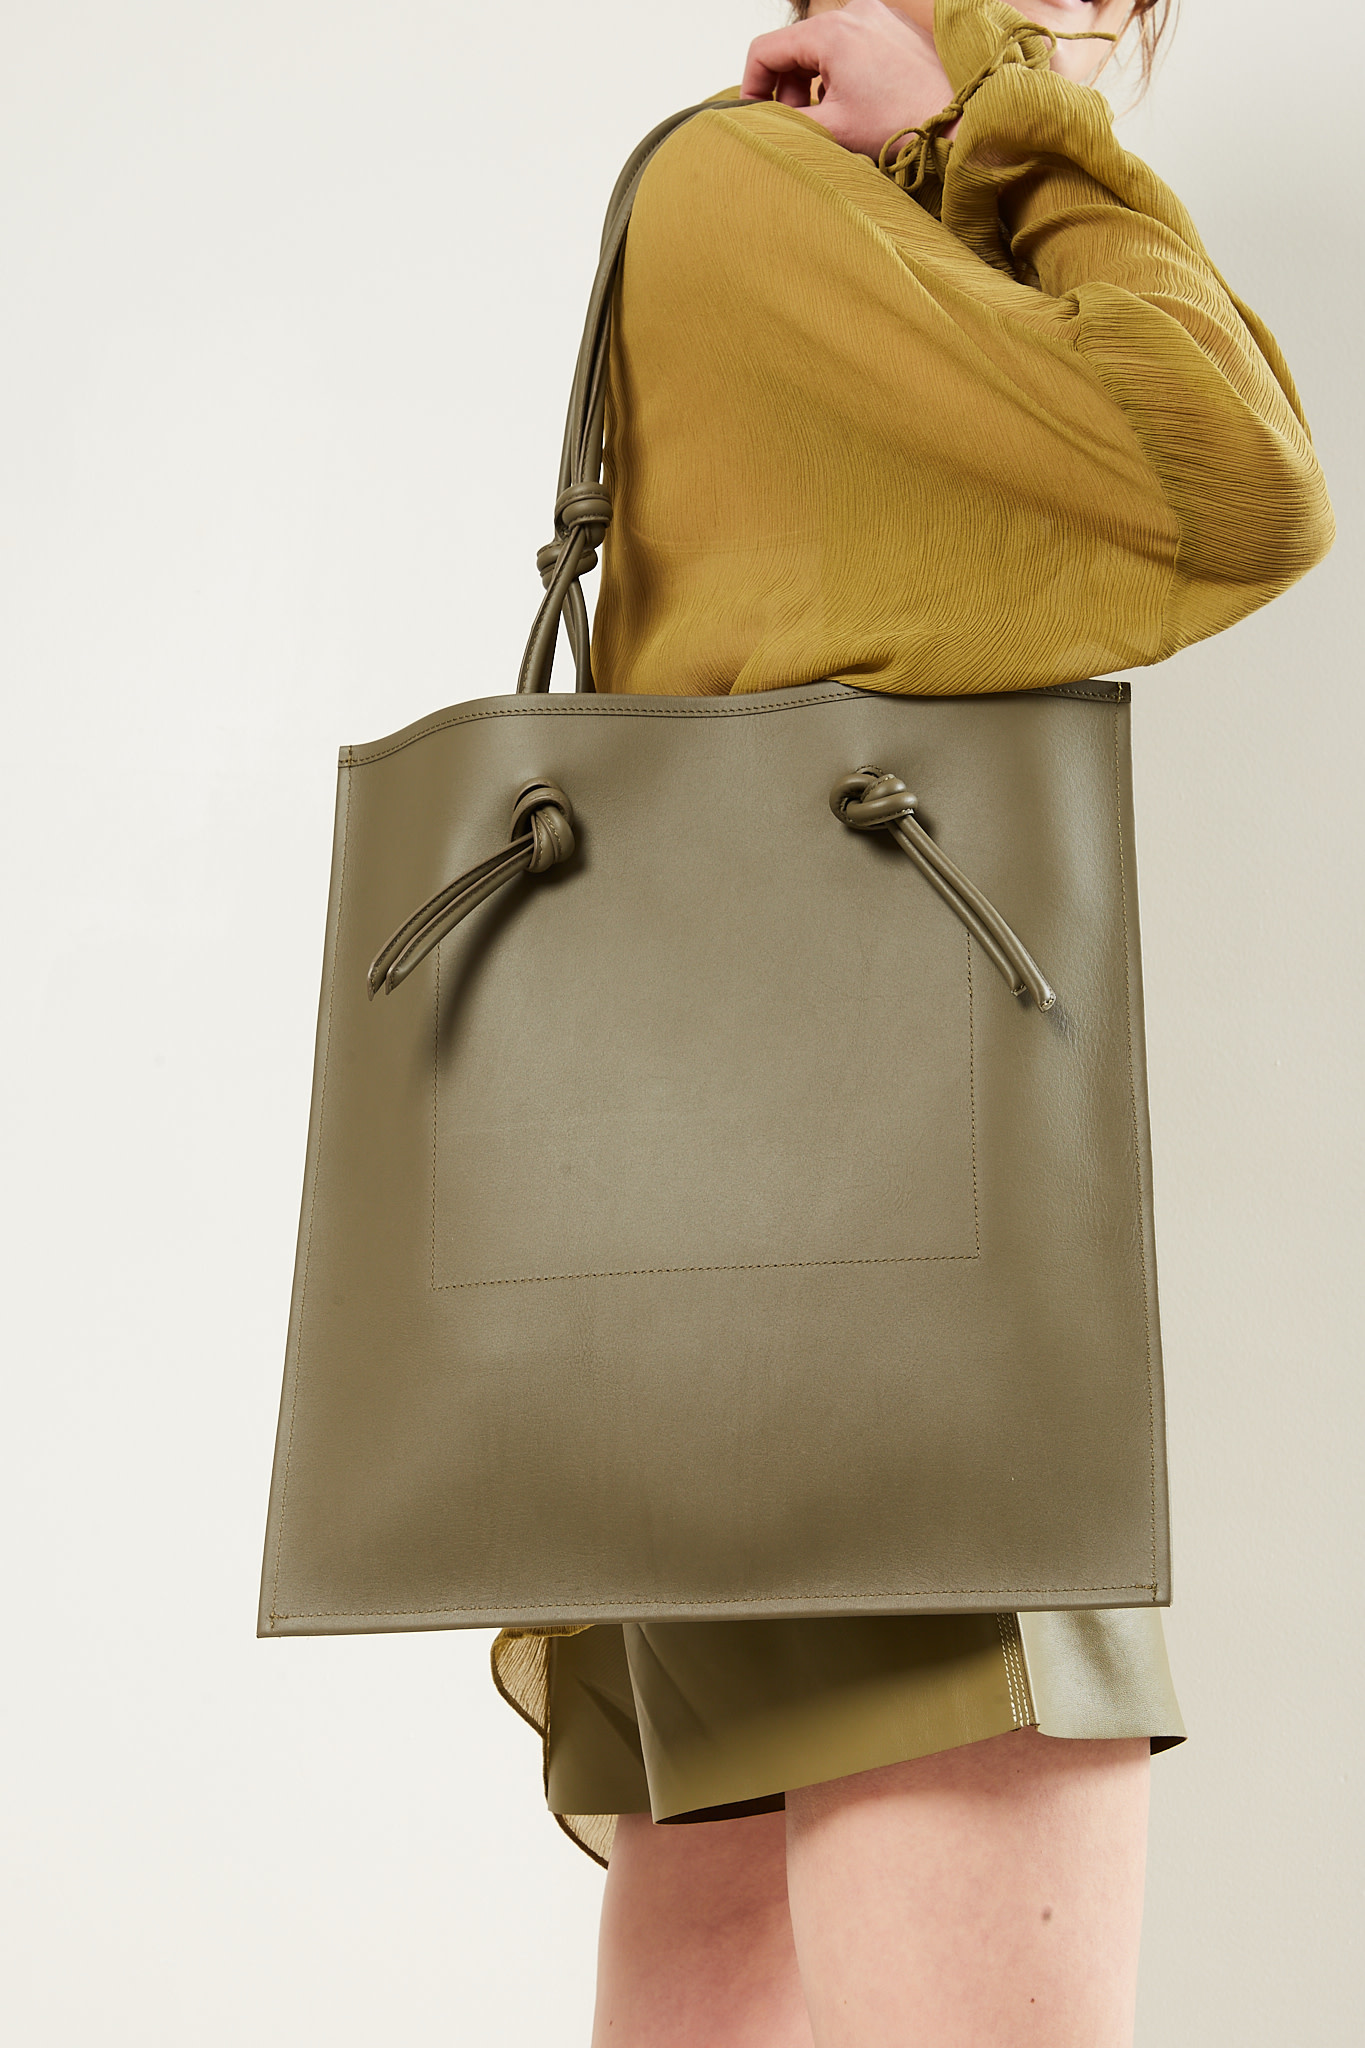 Aeron - Beatrice bag